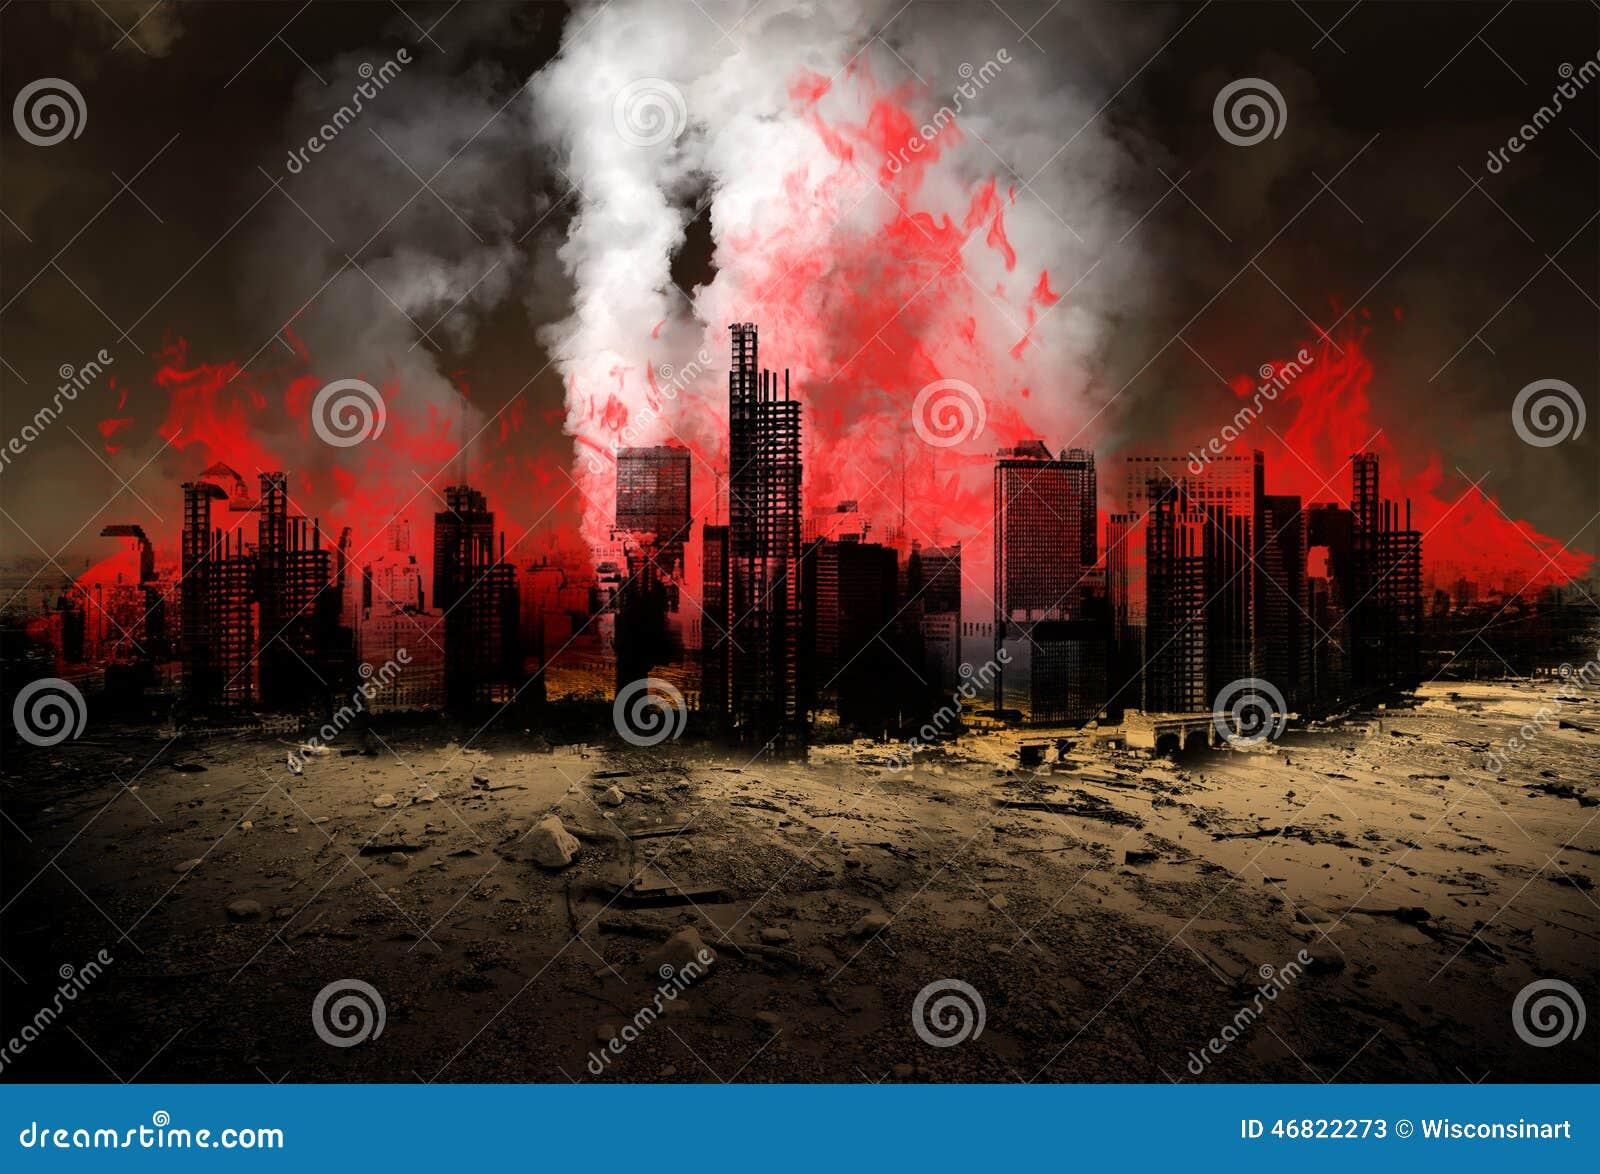 Earthquake, Natural Disaster, Apocalypse, Burning City